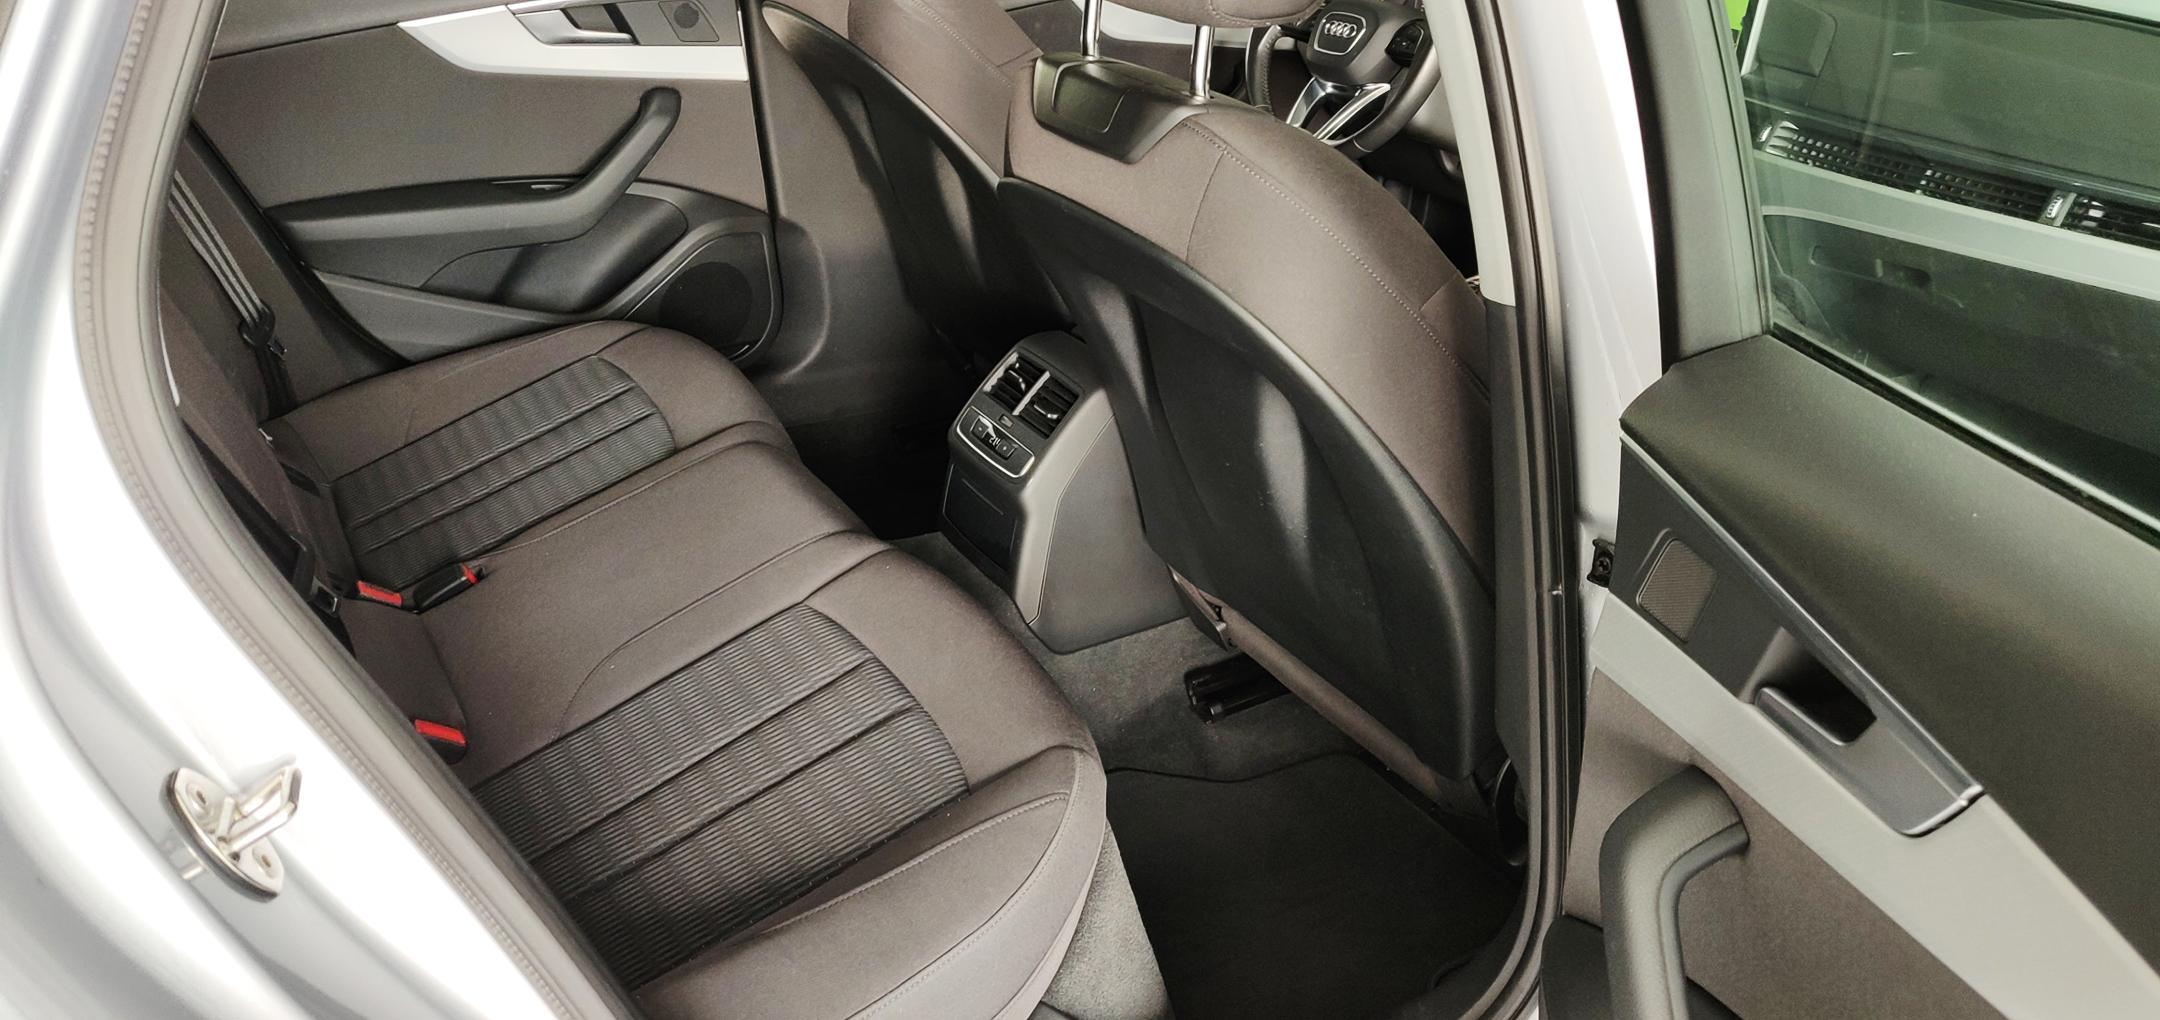 Audi A4 2.0 AVANT | Imagem 15